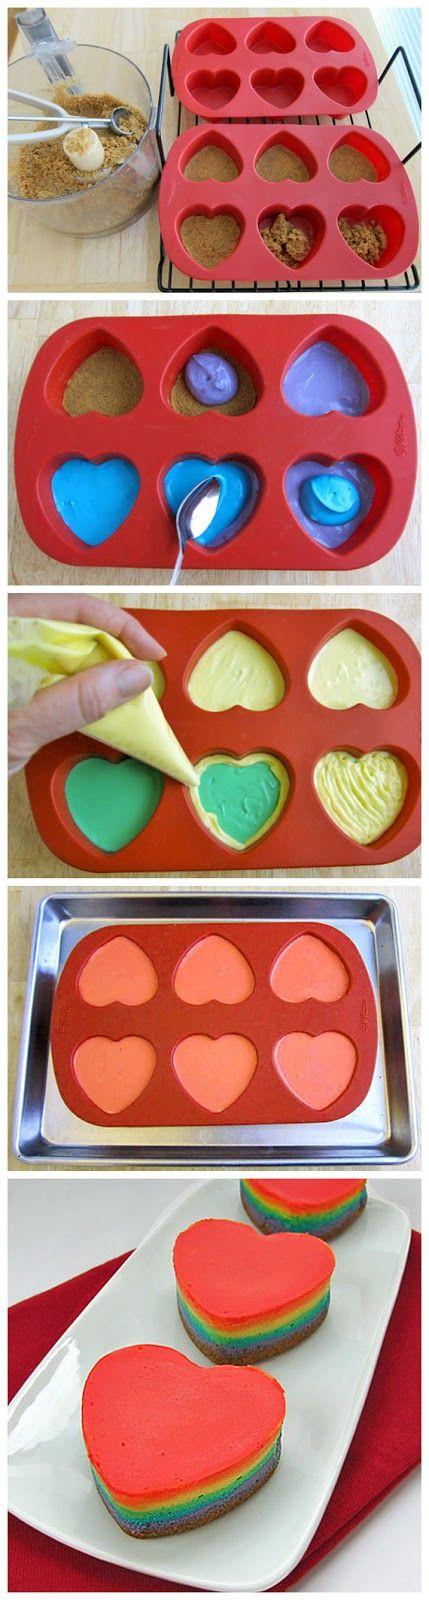 Mini Rainbow Cheesecakes... Mmm...  Pinned by Angel